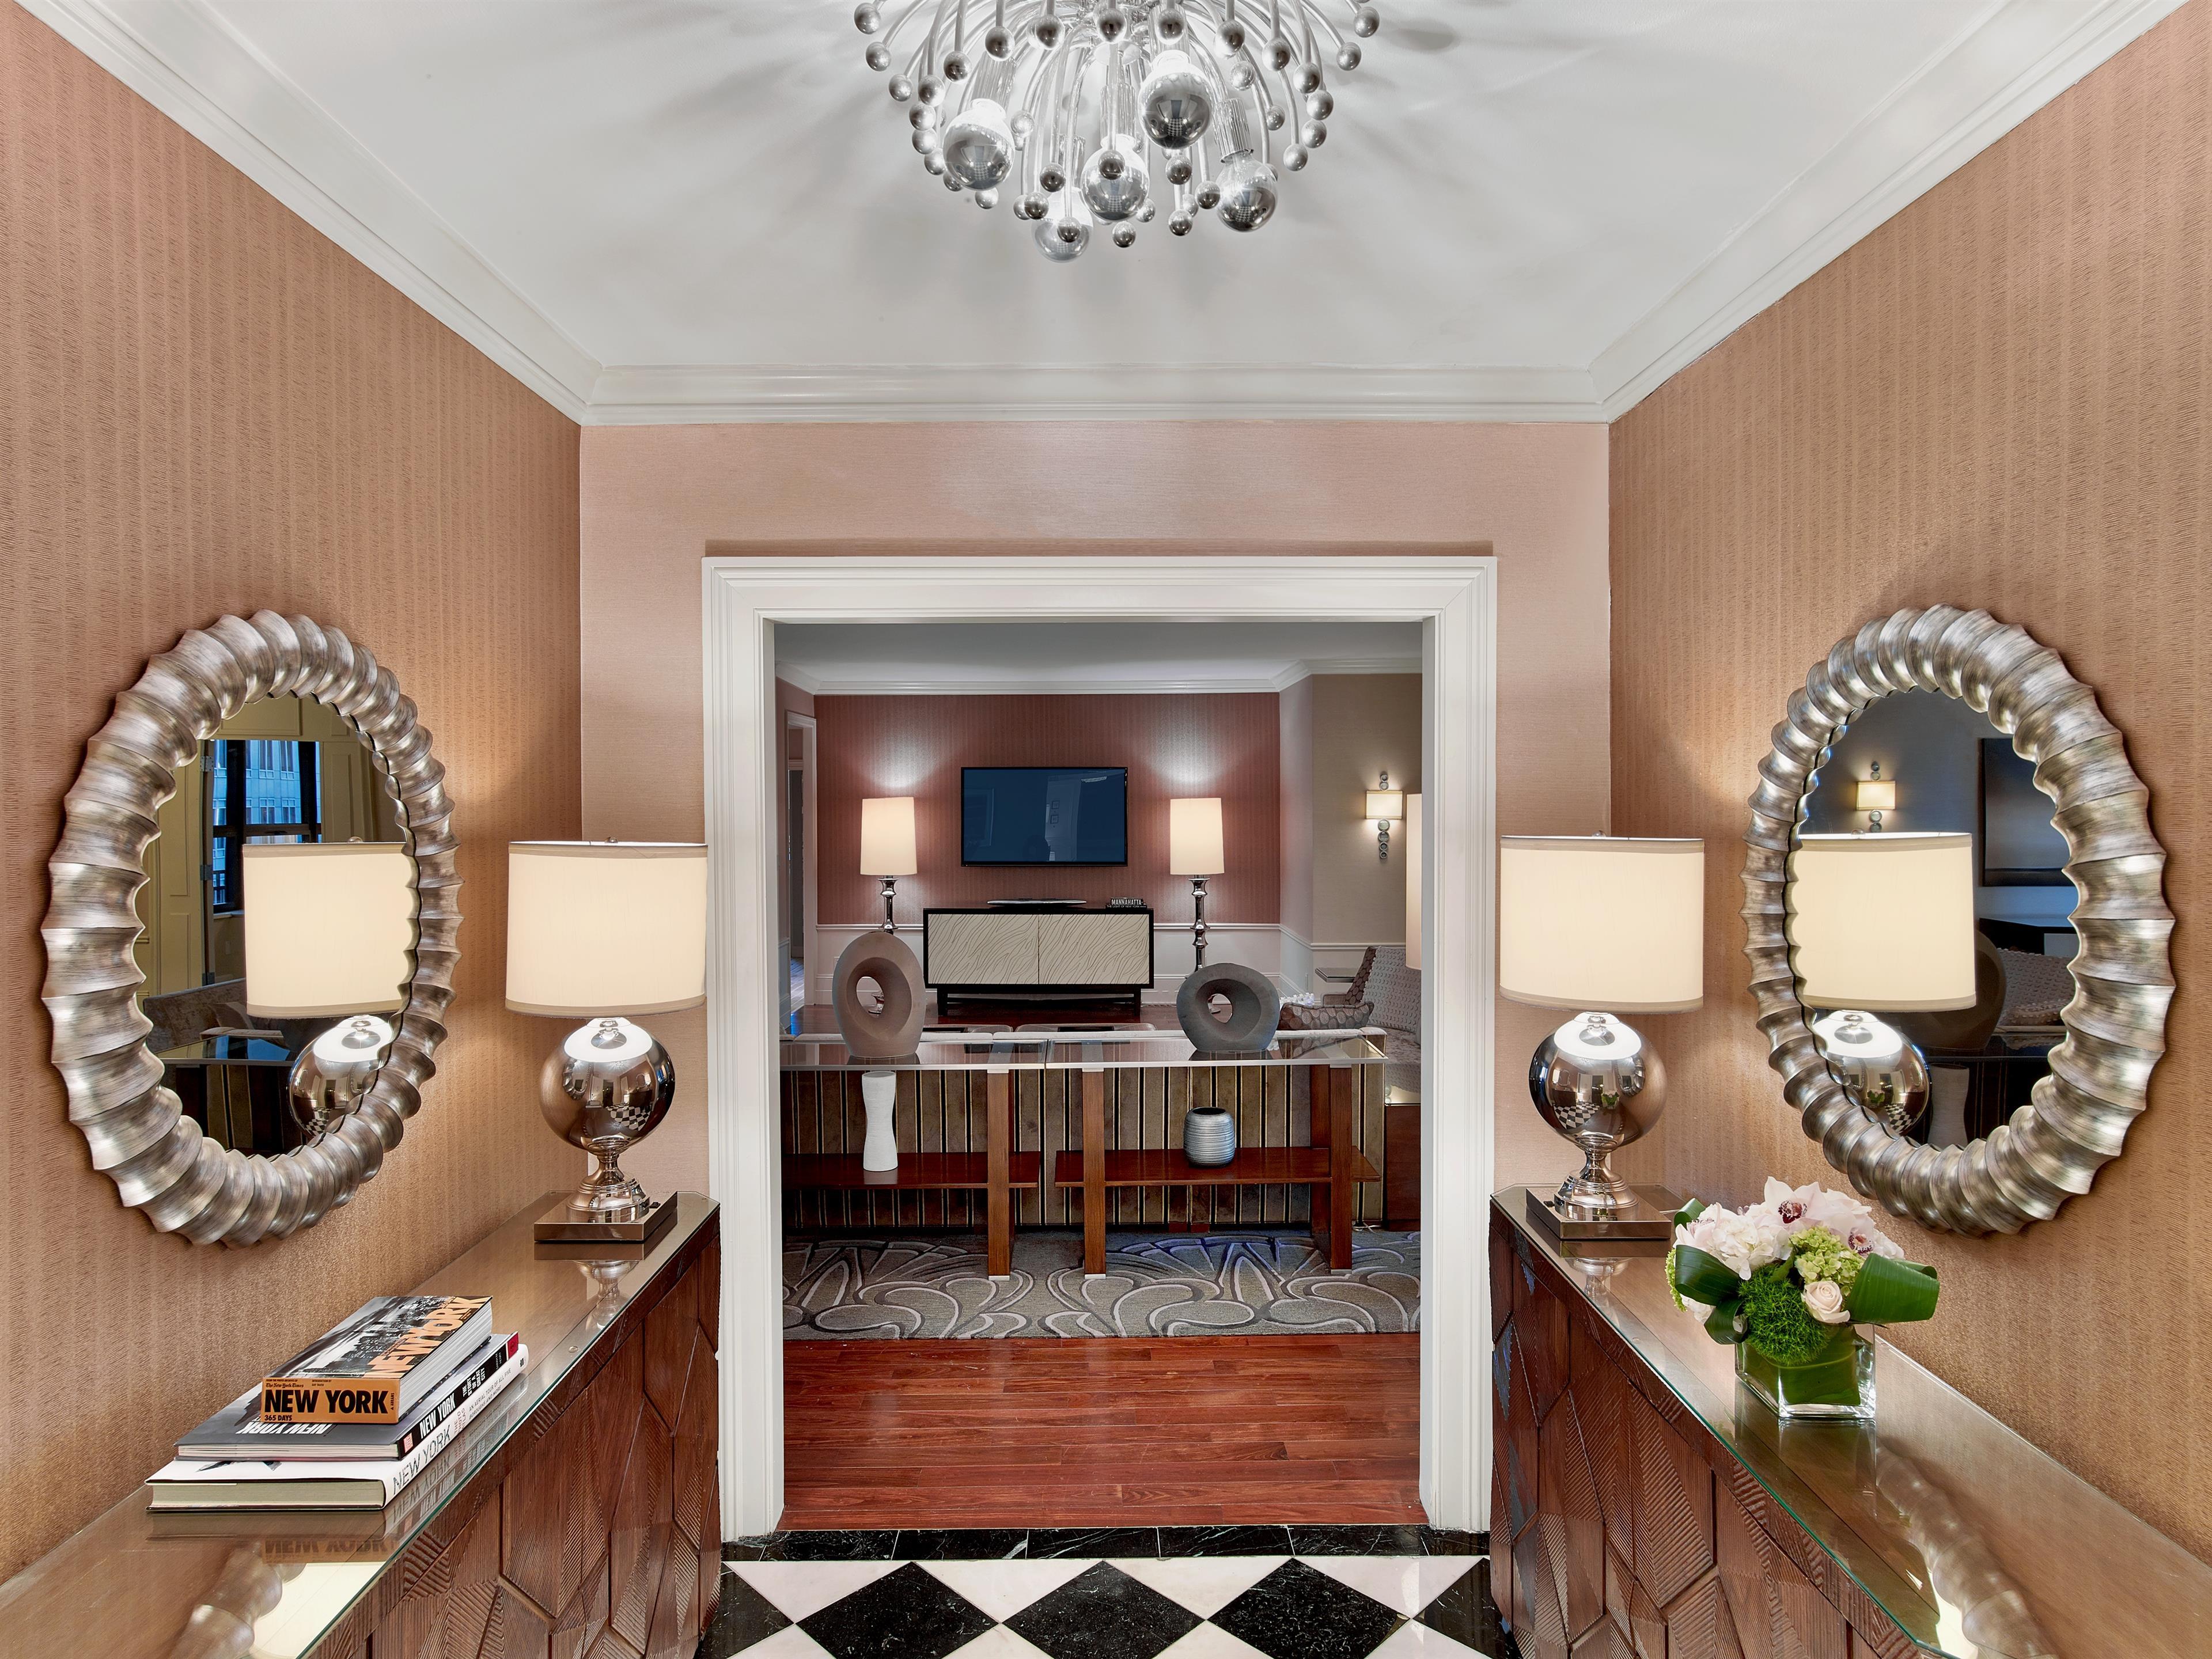 Sheraton New York Times Square Hotel image 46